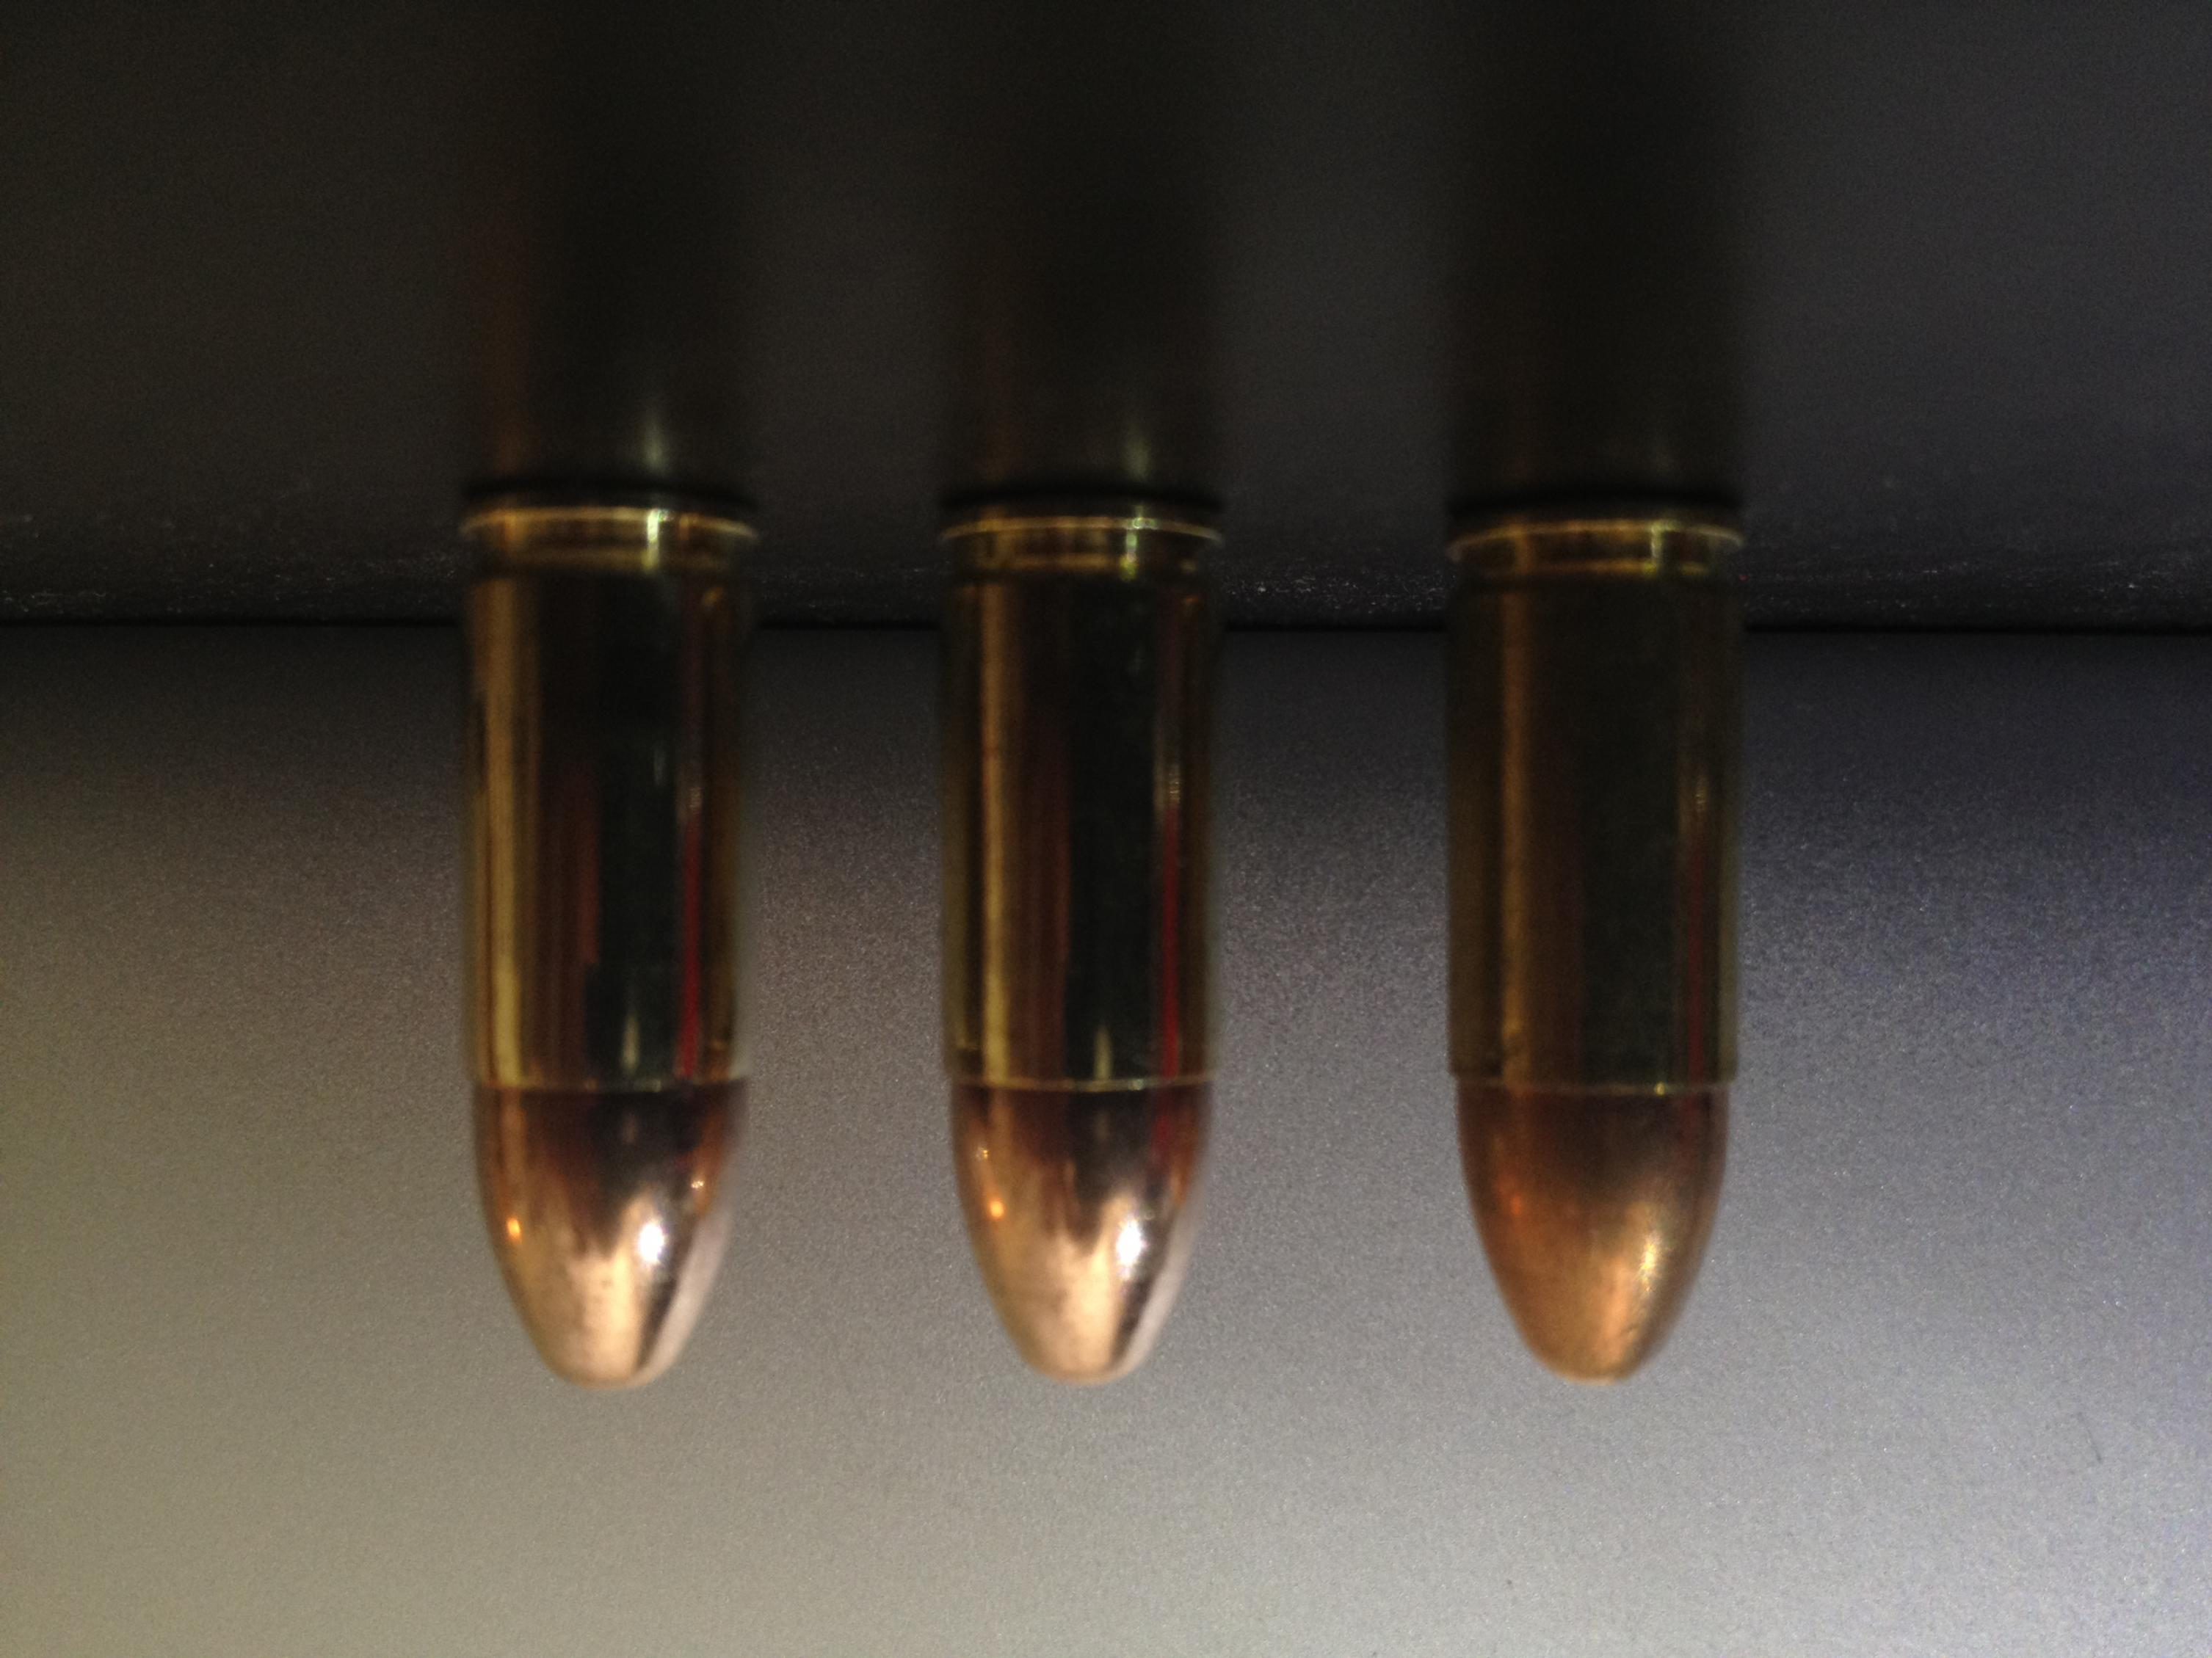 9mm Winchester NATO in 115 grain 100 Round value pack?